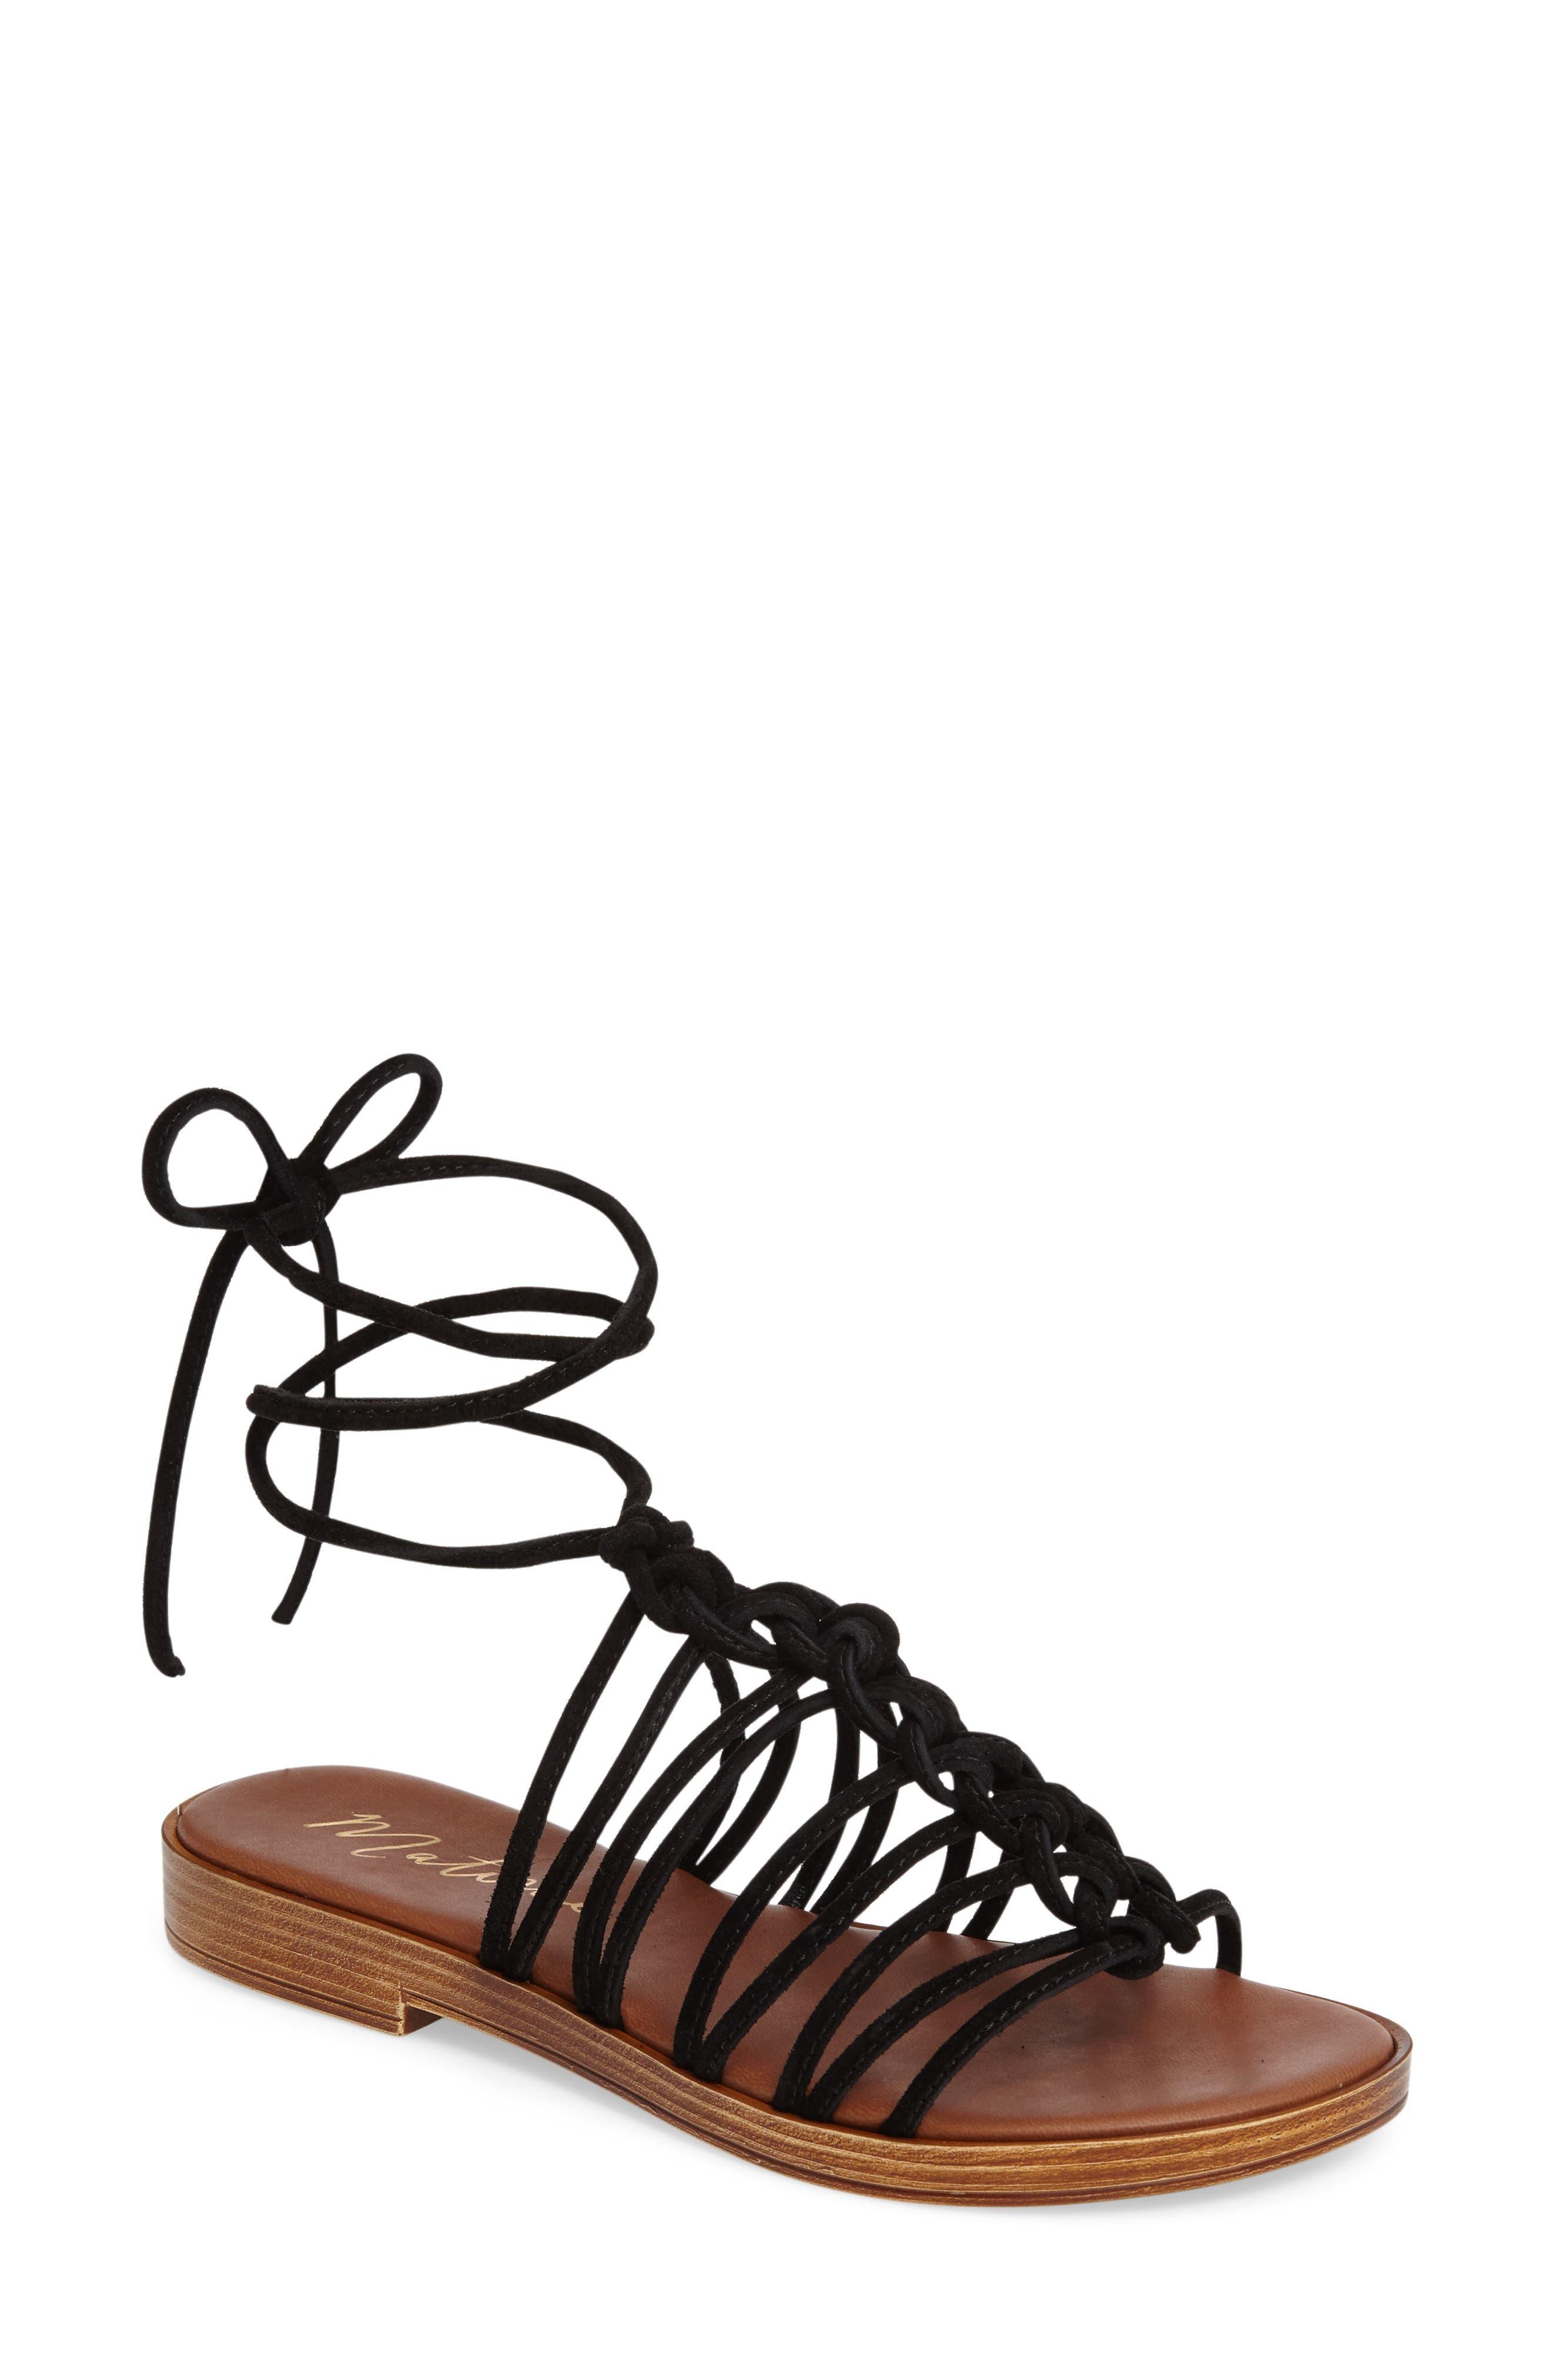 Matisse Origin Lace-Up Sandal (Women)